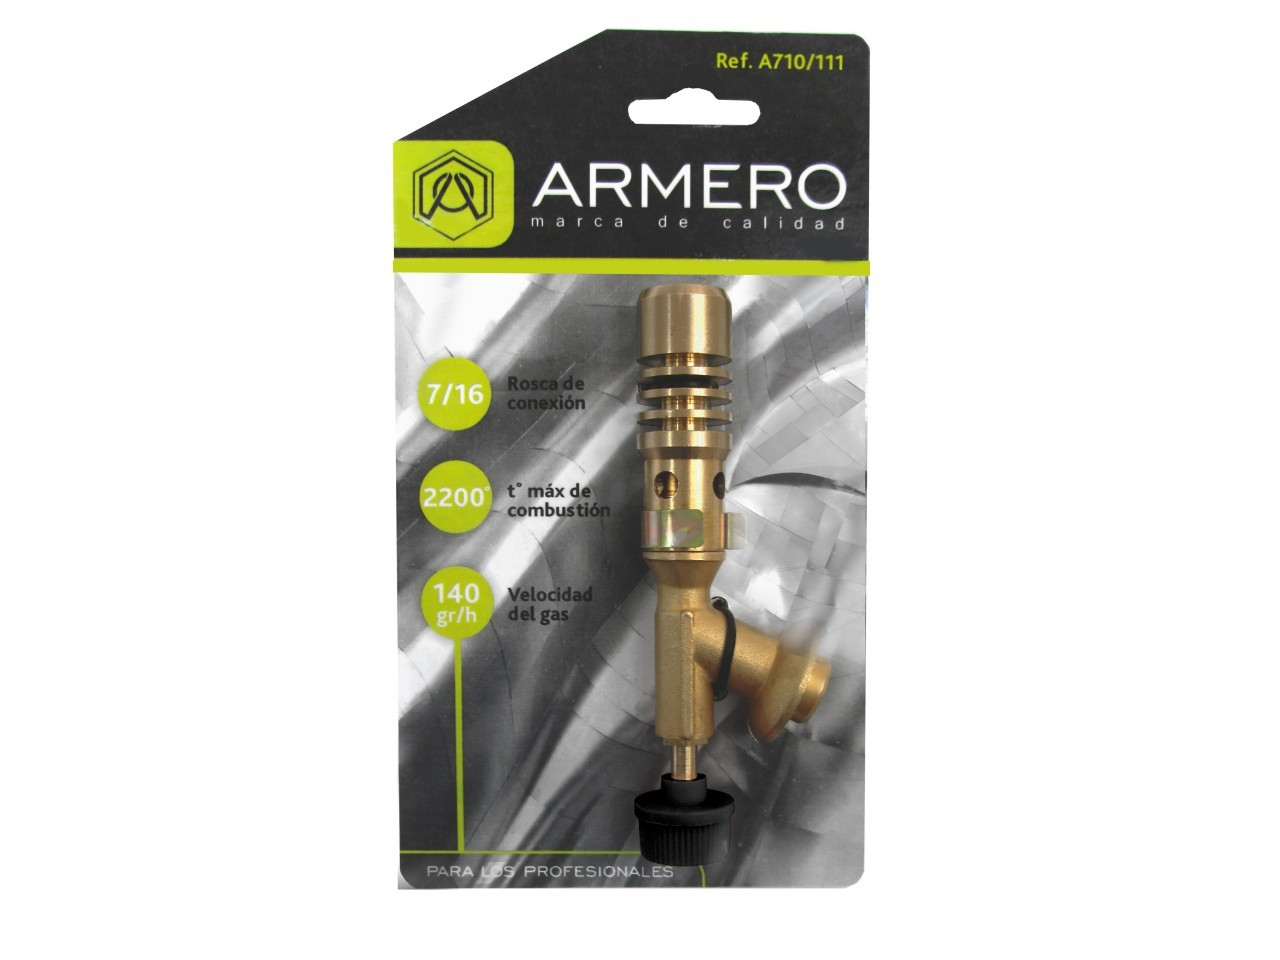 Горелка газовая Armero Ag10-113 горелка кровельная armero ag20 080